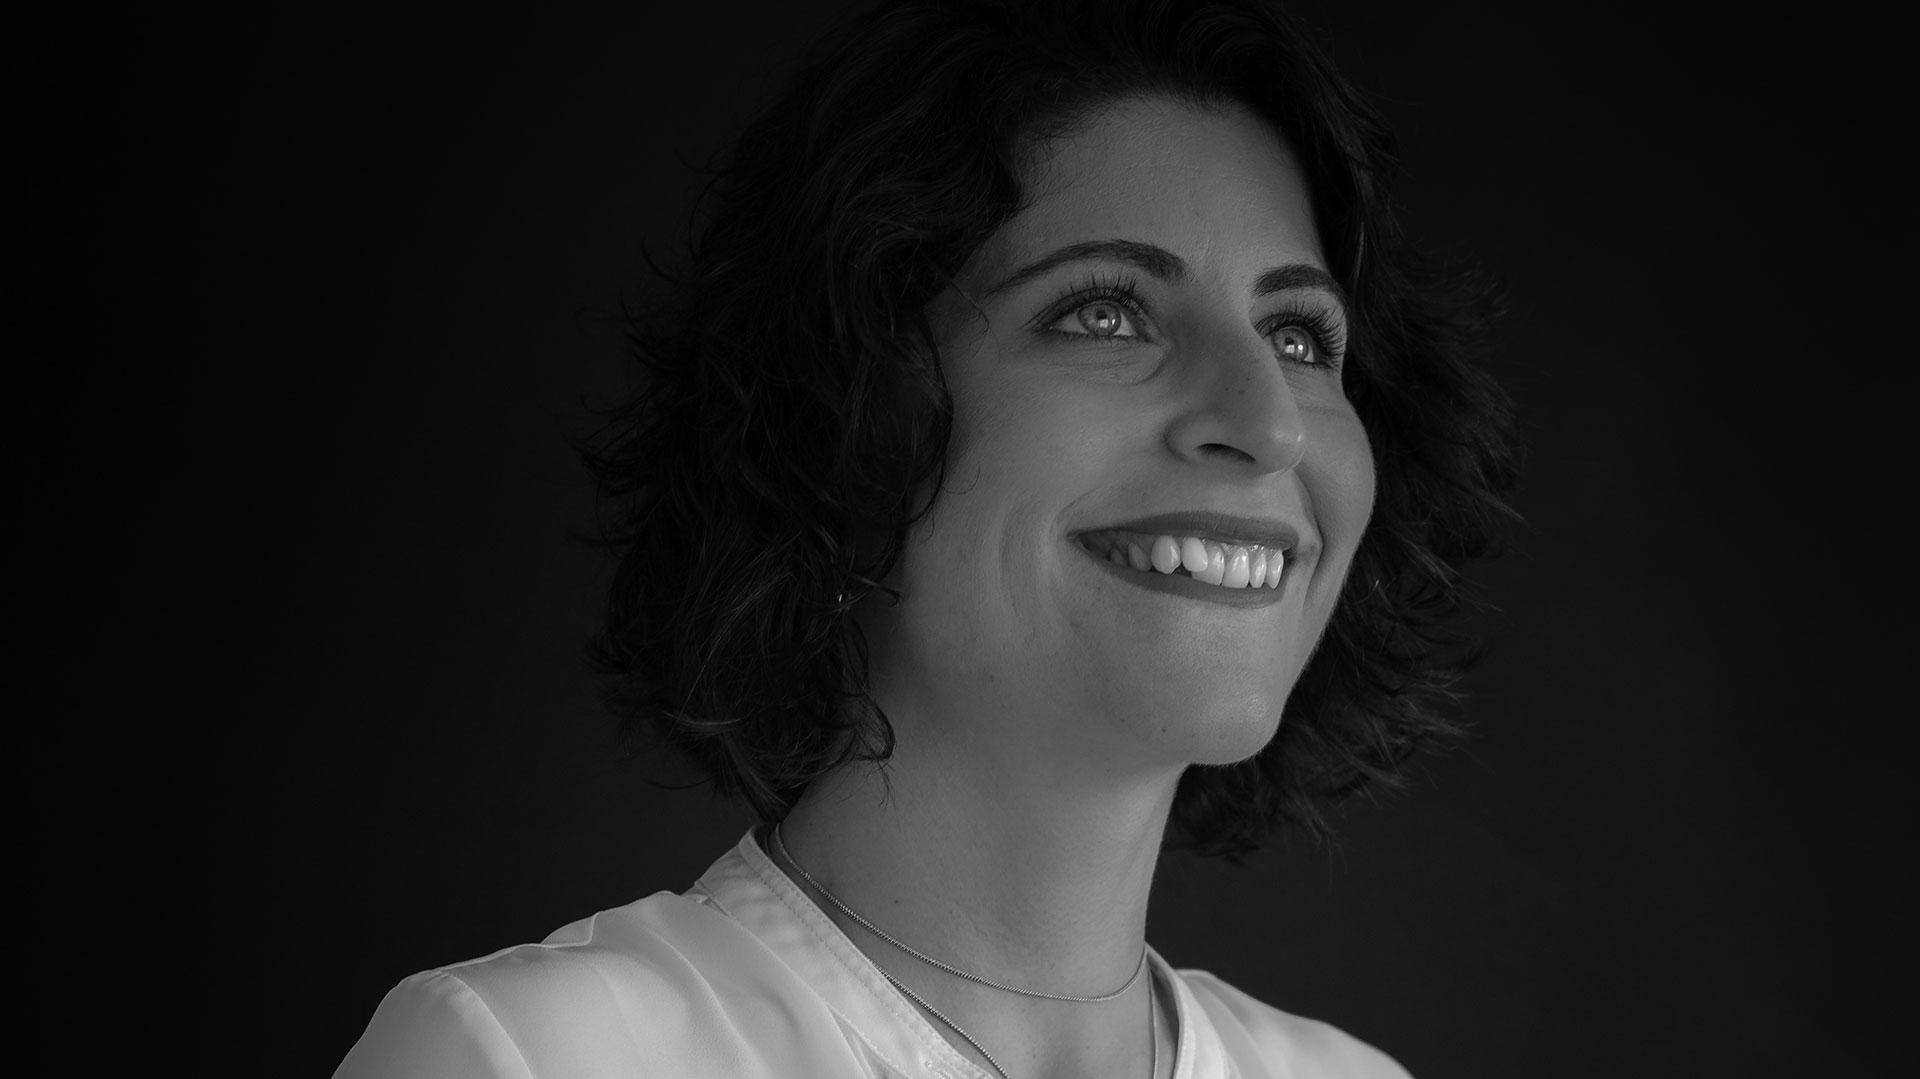 Dra. Elena Saura